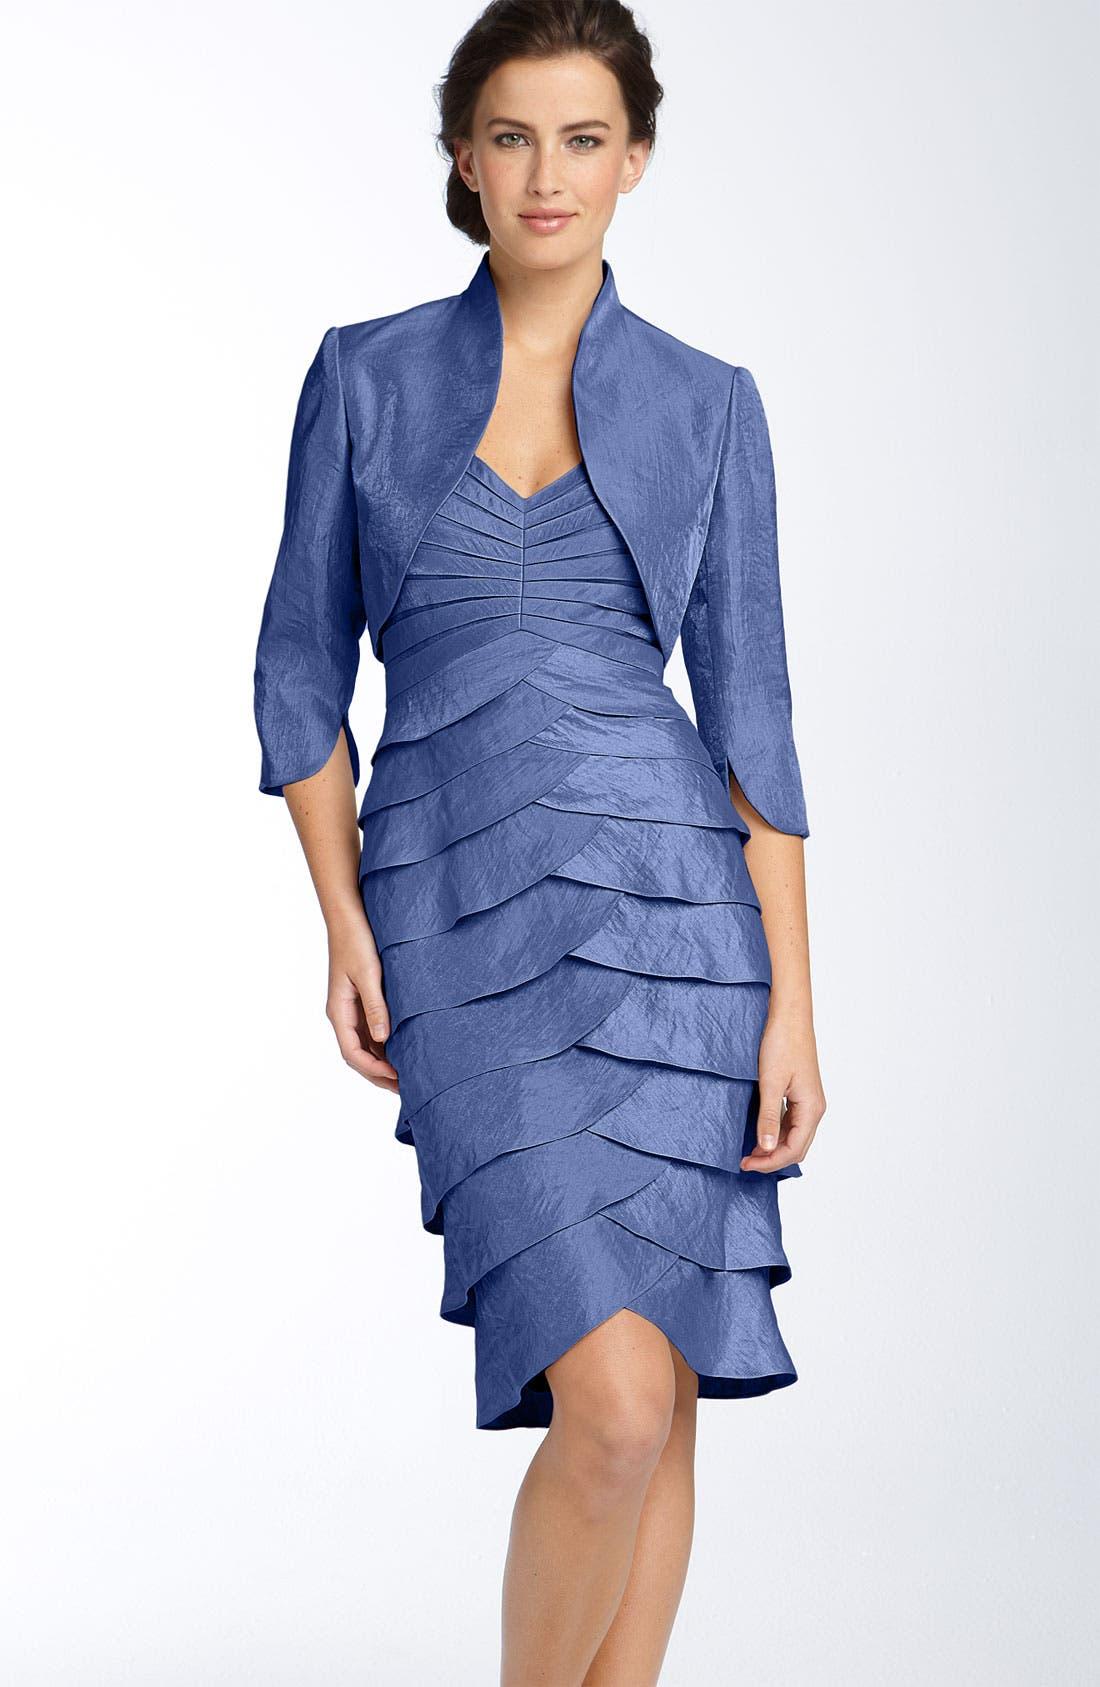 Main Image - Adrianna Papell Tiered Hammered Satin Sheath Dress & Bolero (Regular & Petite)